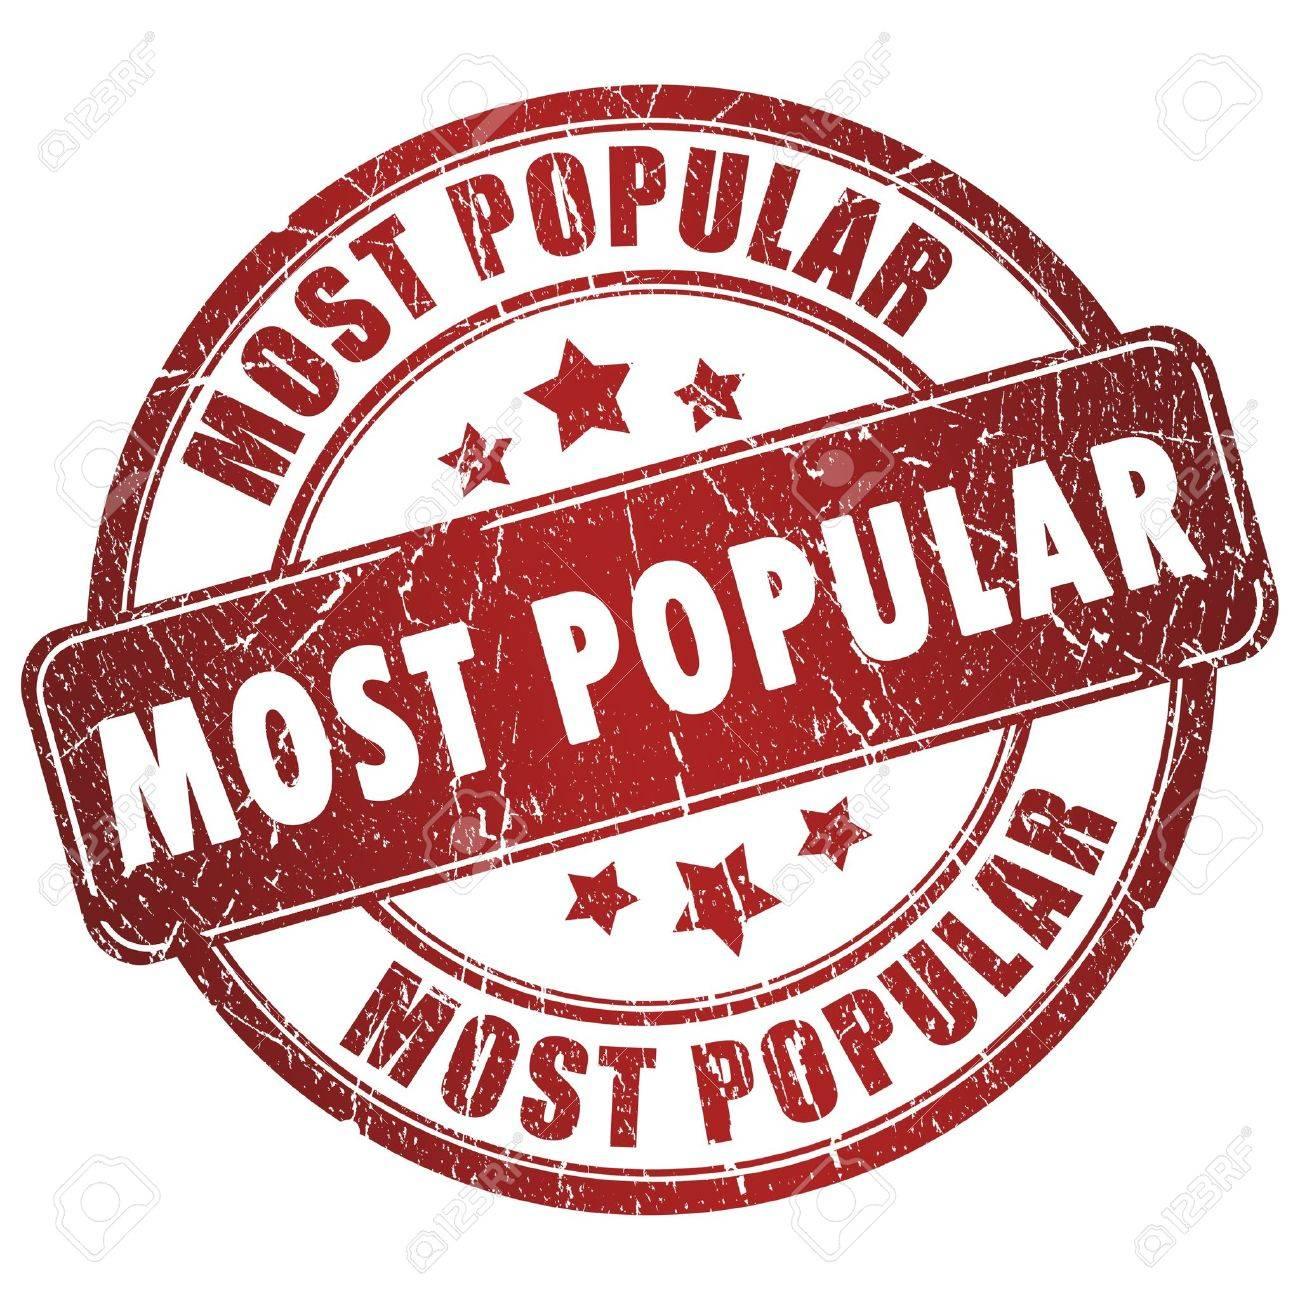 Most Popular Stamp Stock Photo 15559567